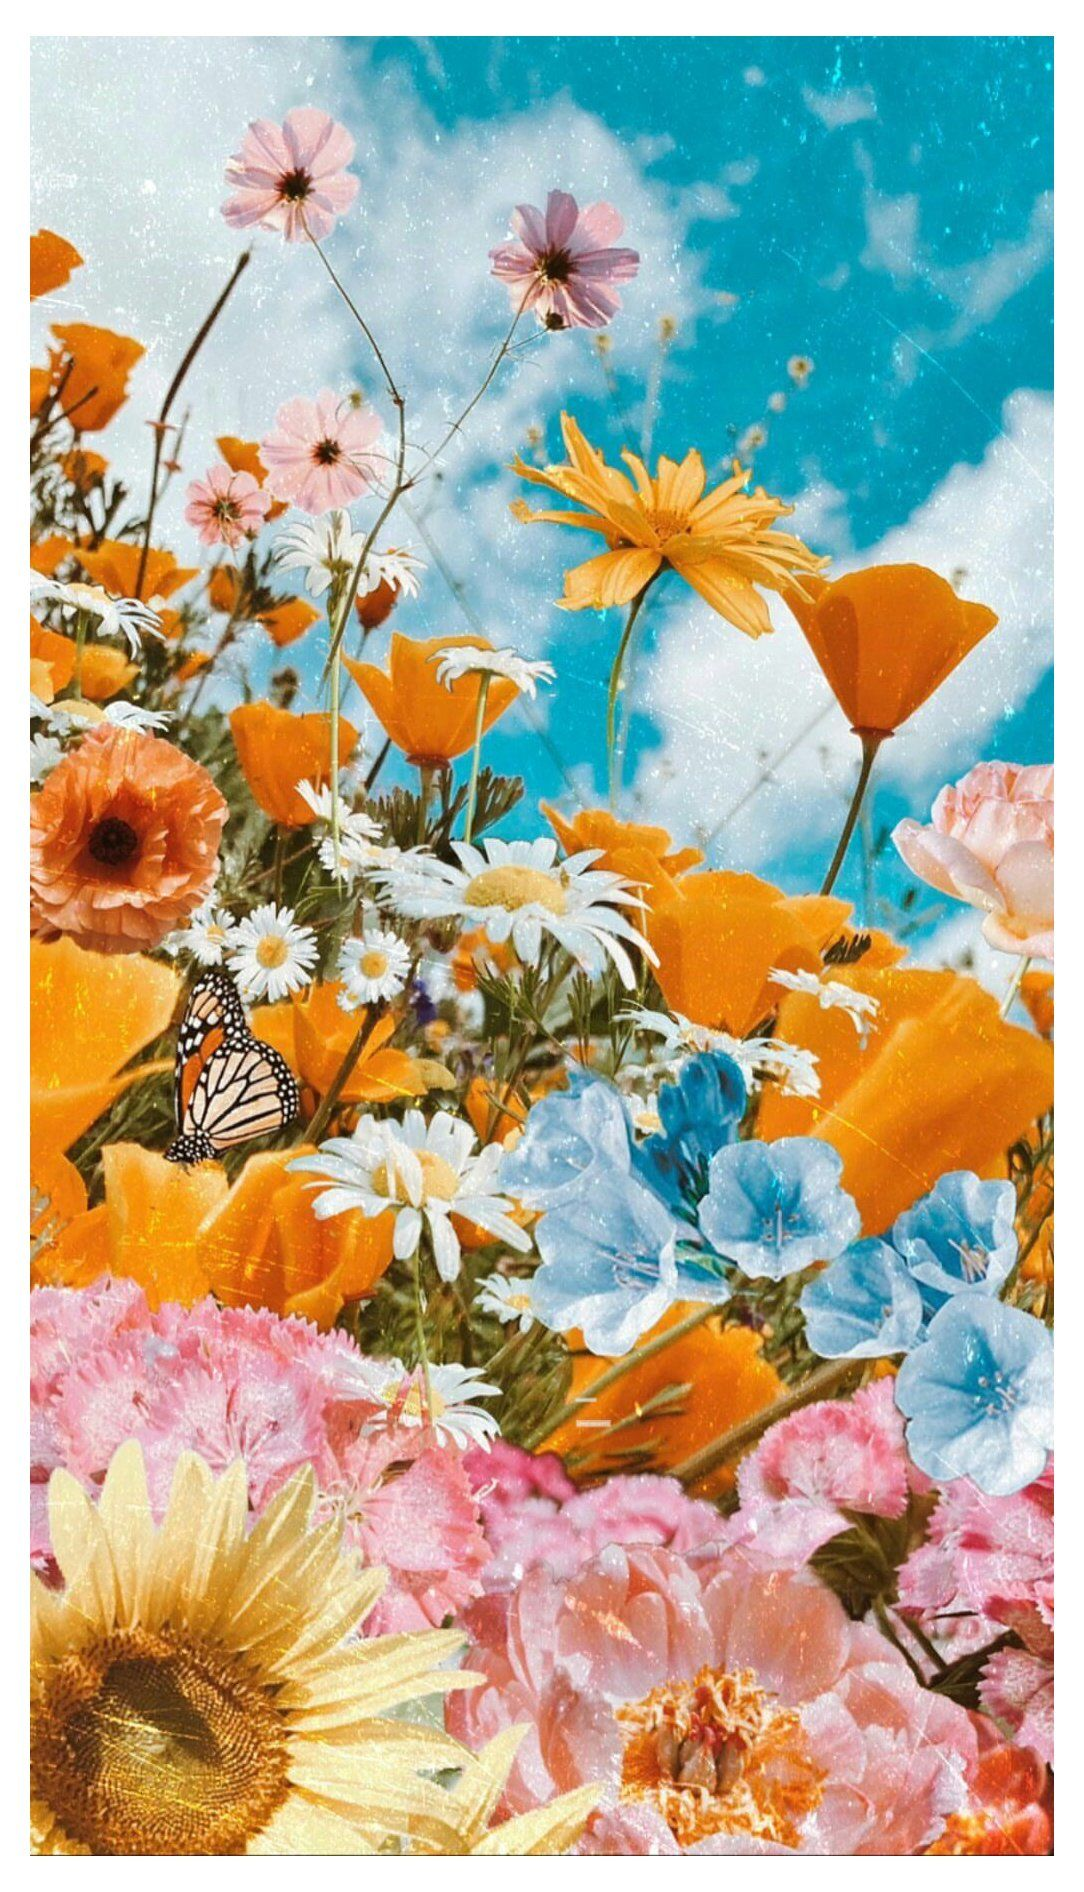 beautiful flowers wallpaper backgrounds nature